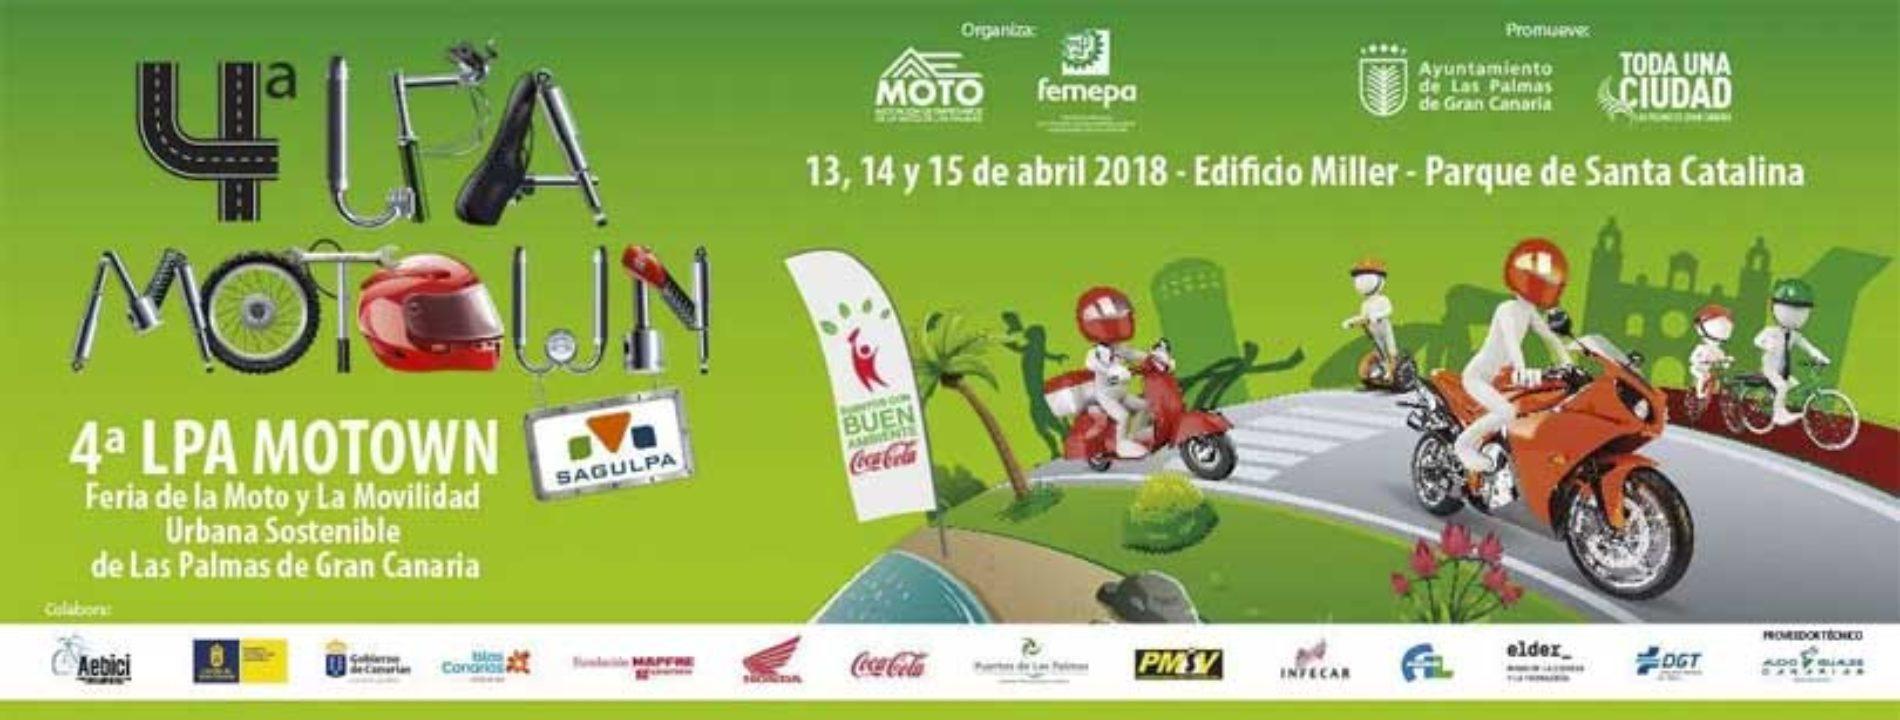 Hva kan du gjøre på Gran Canaria i helgen – 13.-15. mars 2018